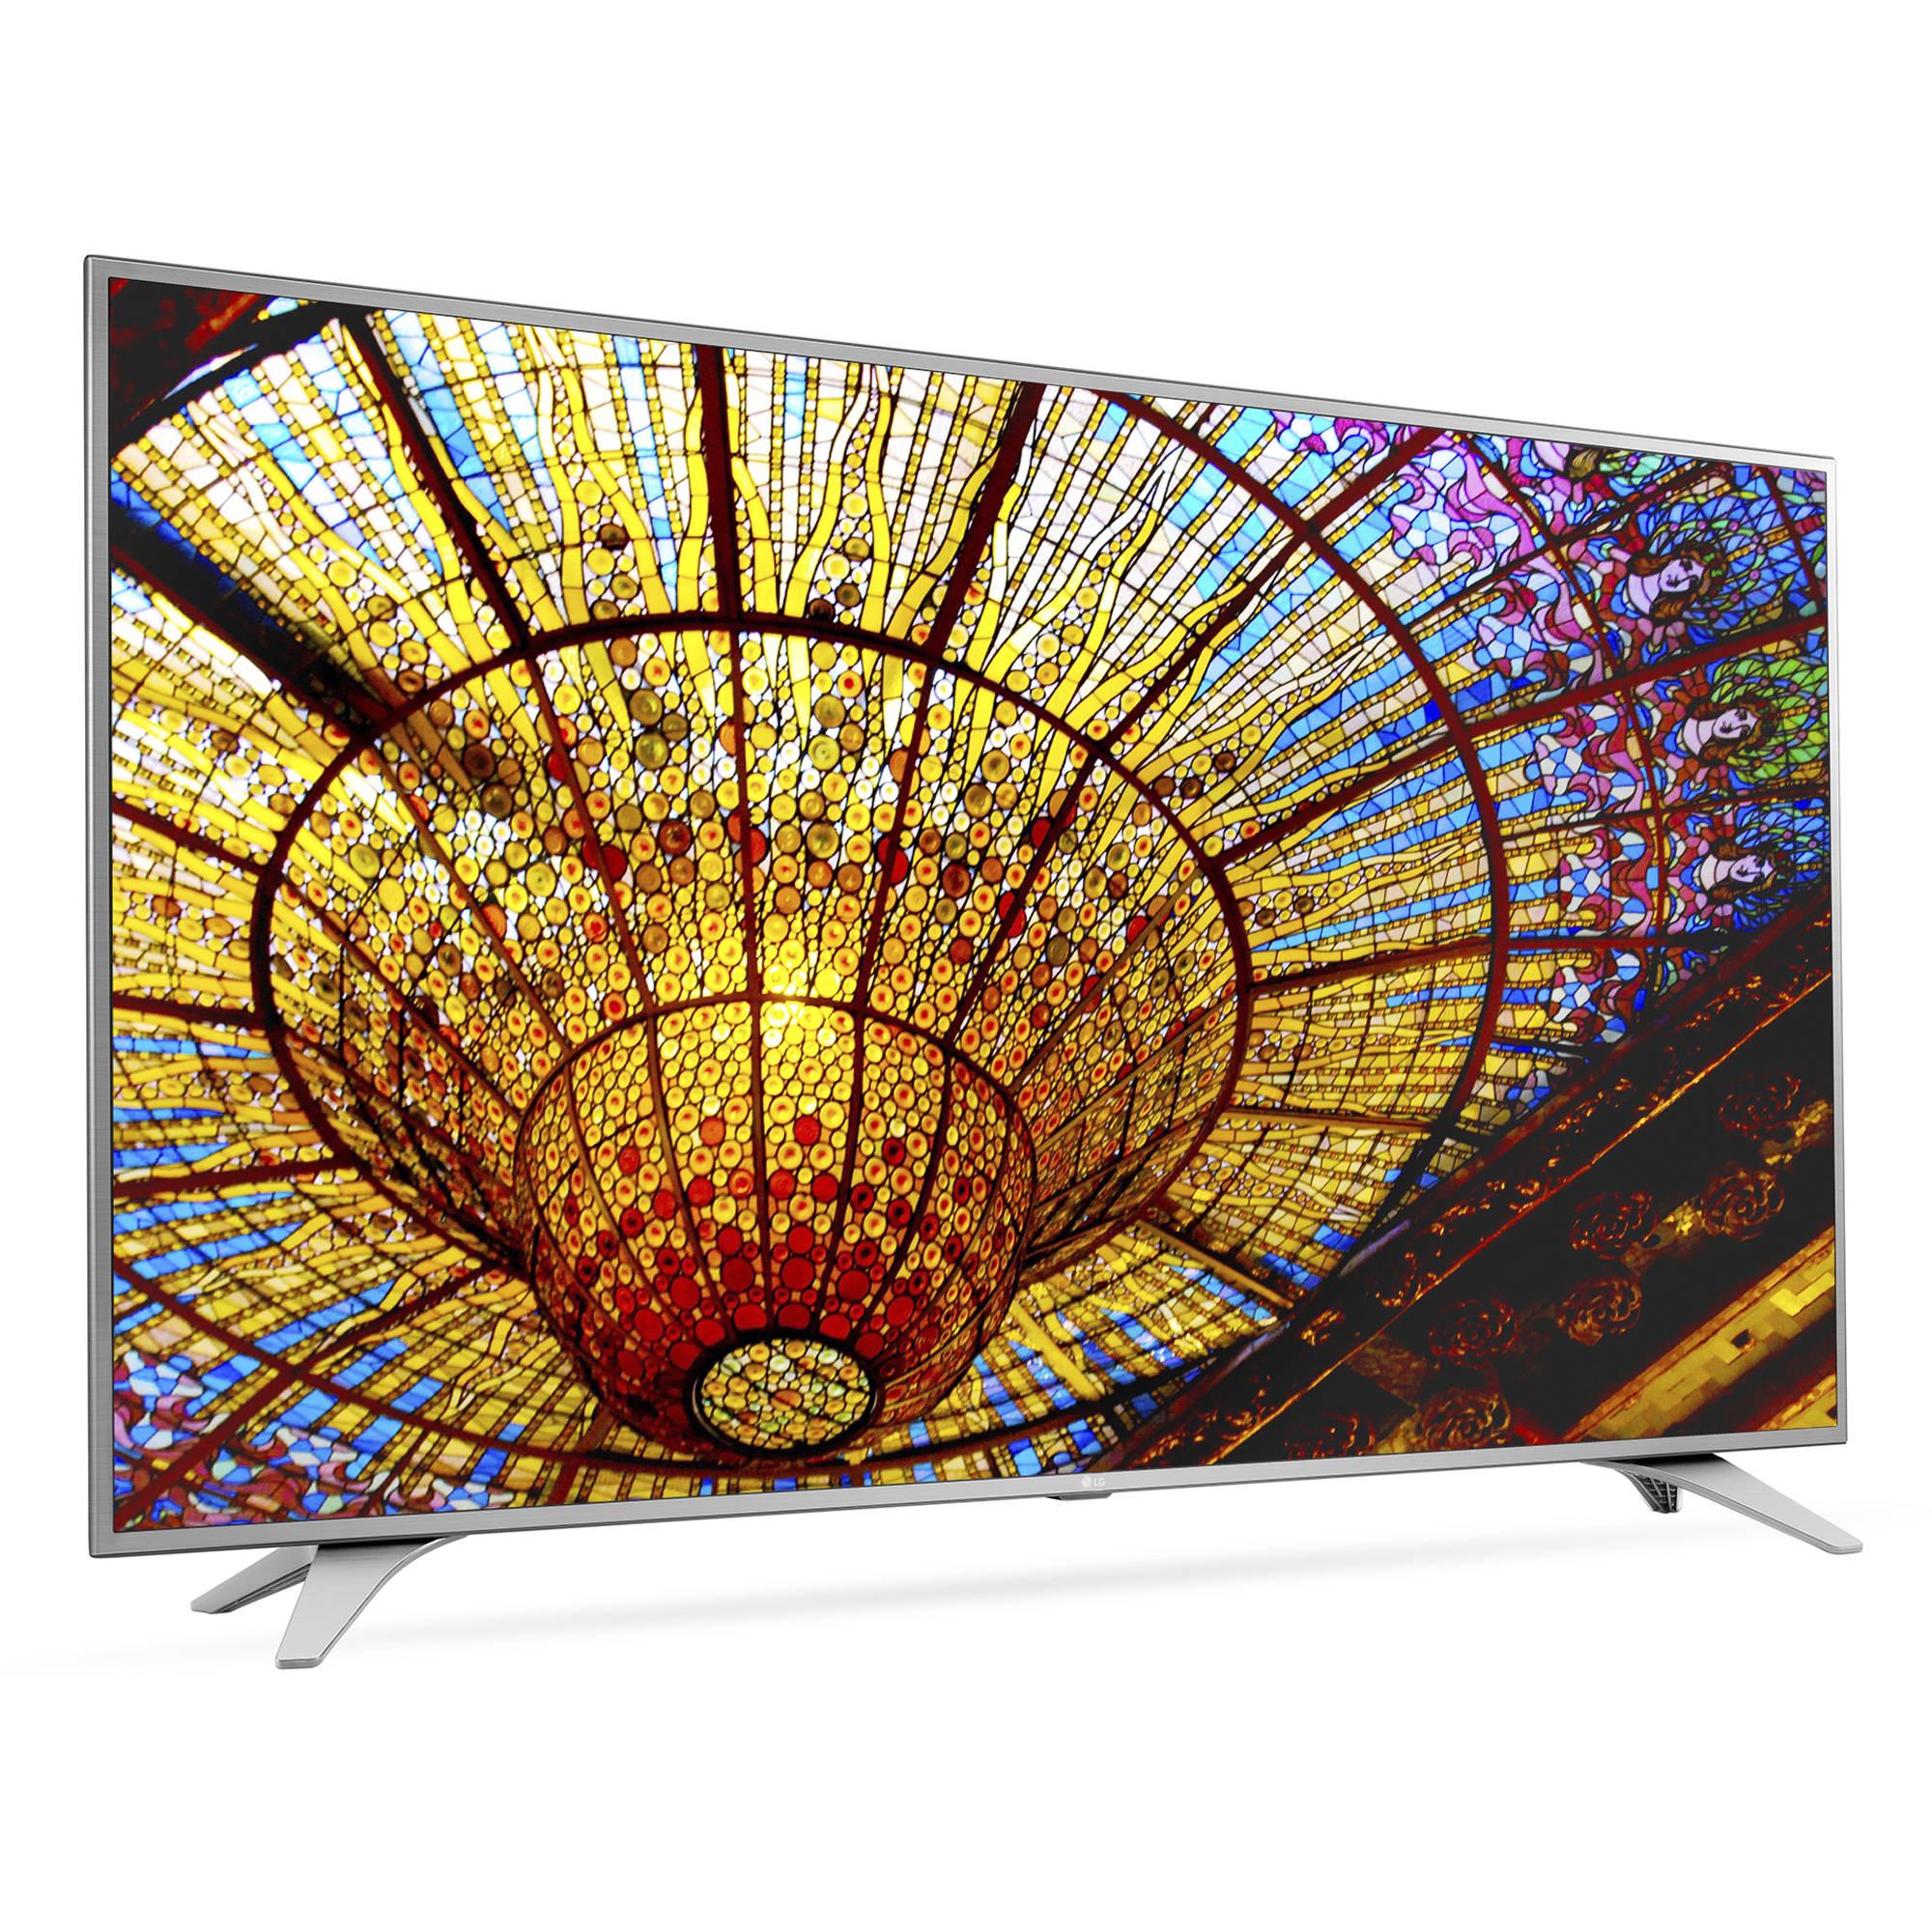 "Lg Uhd Tv 4k 49 Price In India 55 Zoll Full Hd Gebraucht Outdoor Hdtv Antenna 100 Mile Range Hdtv Cable Uses: LG UH6500 49"" 4K UHD SMART TV"